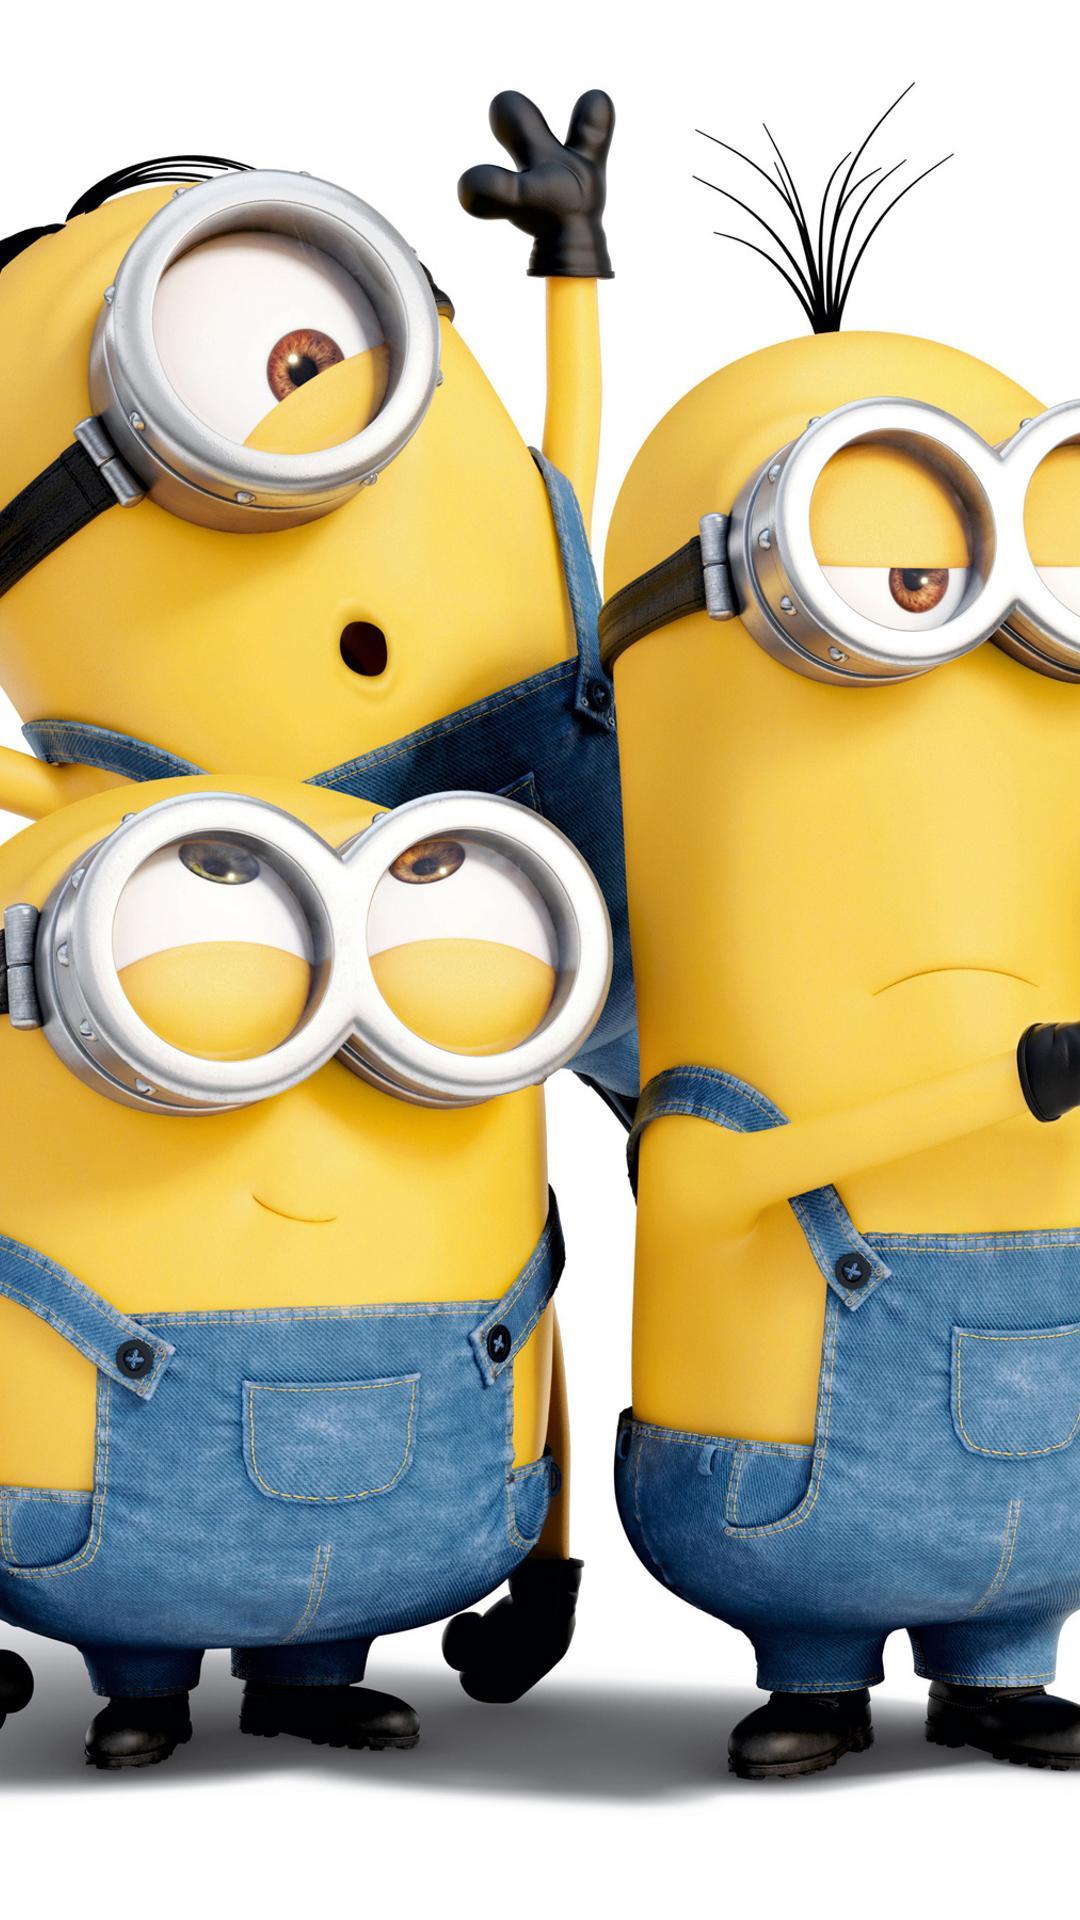 Three crazy minions make a selfie - Funny cartoon ...